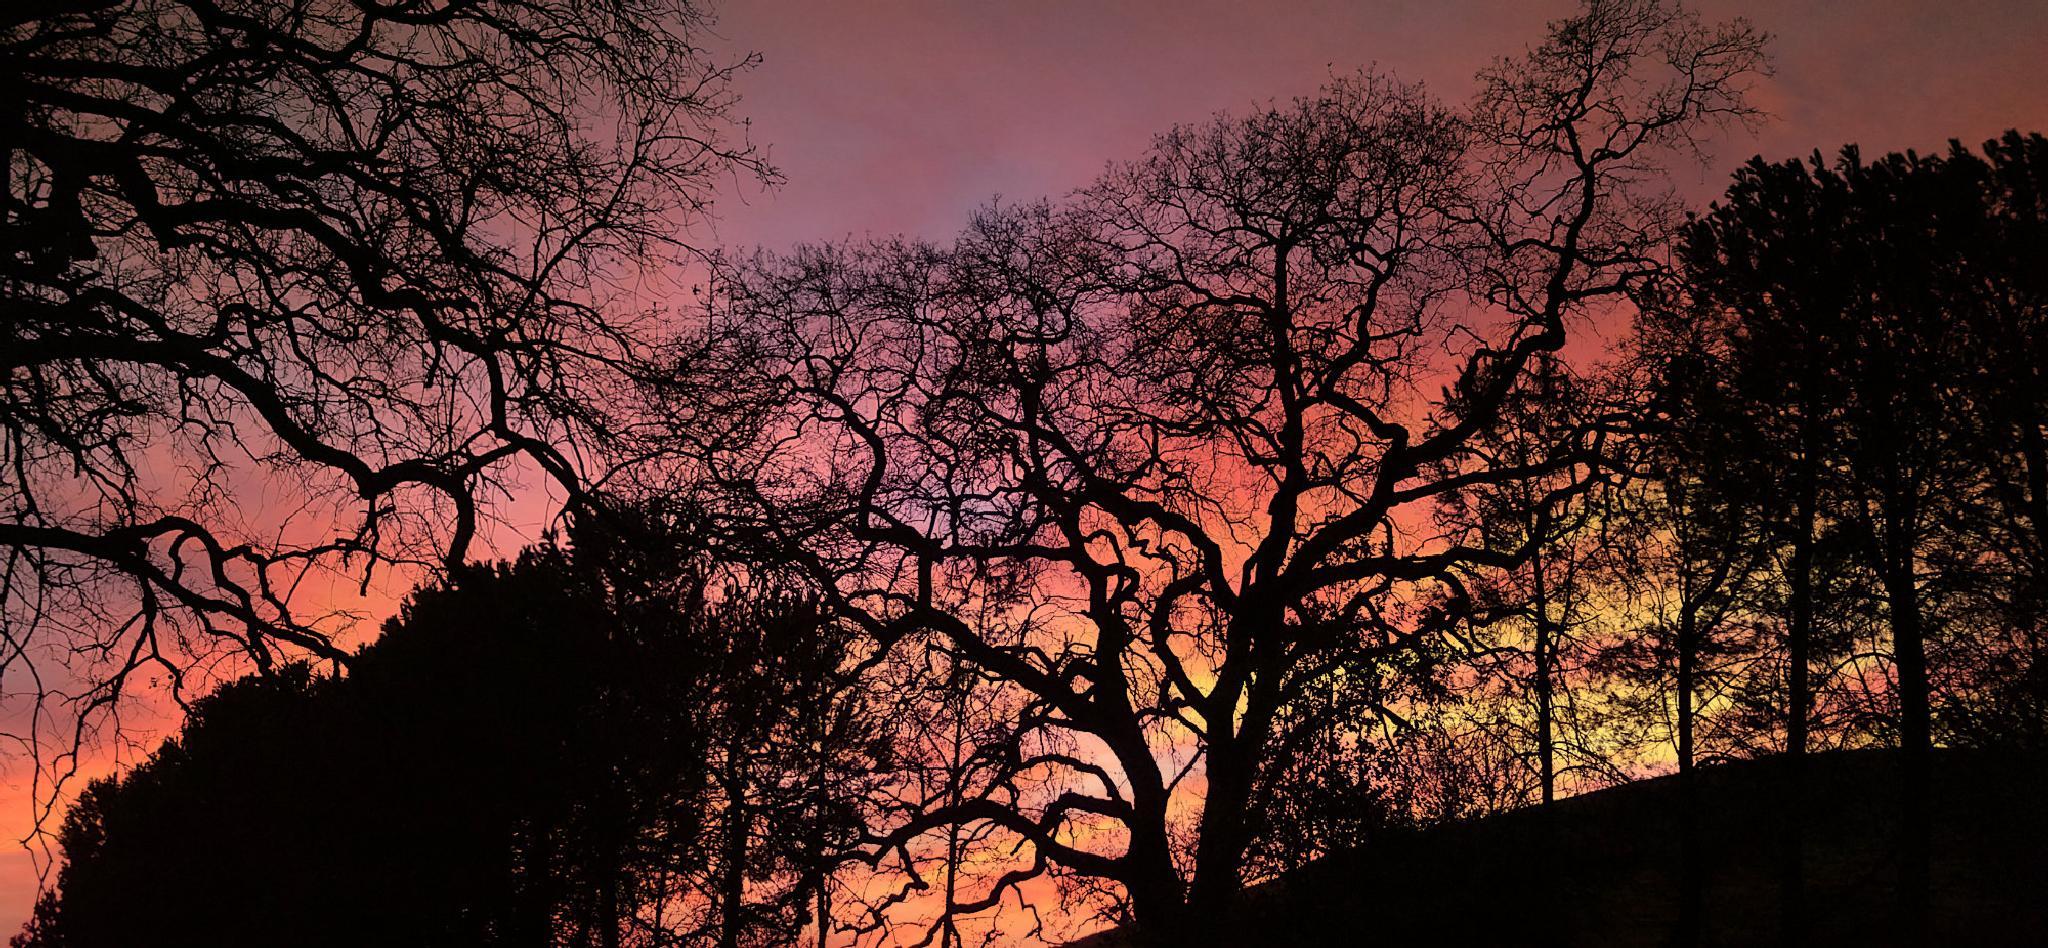 Sunset through trees by KellyDWidener